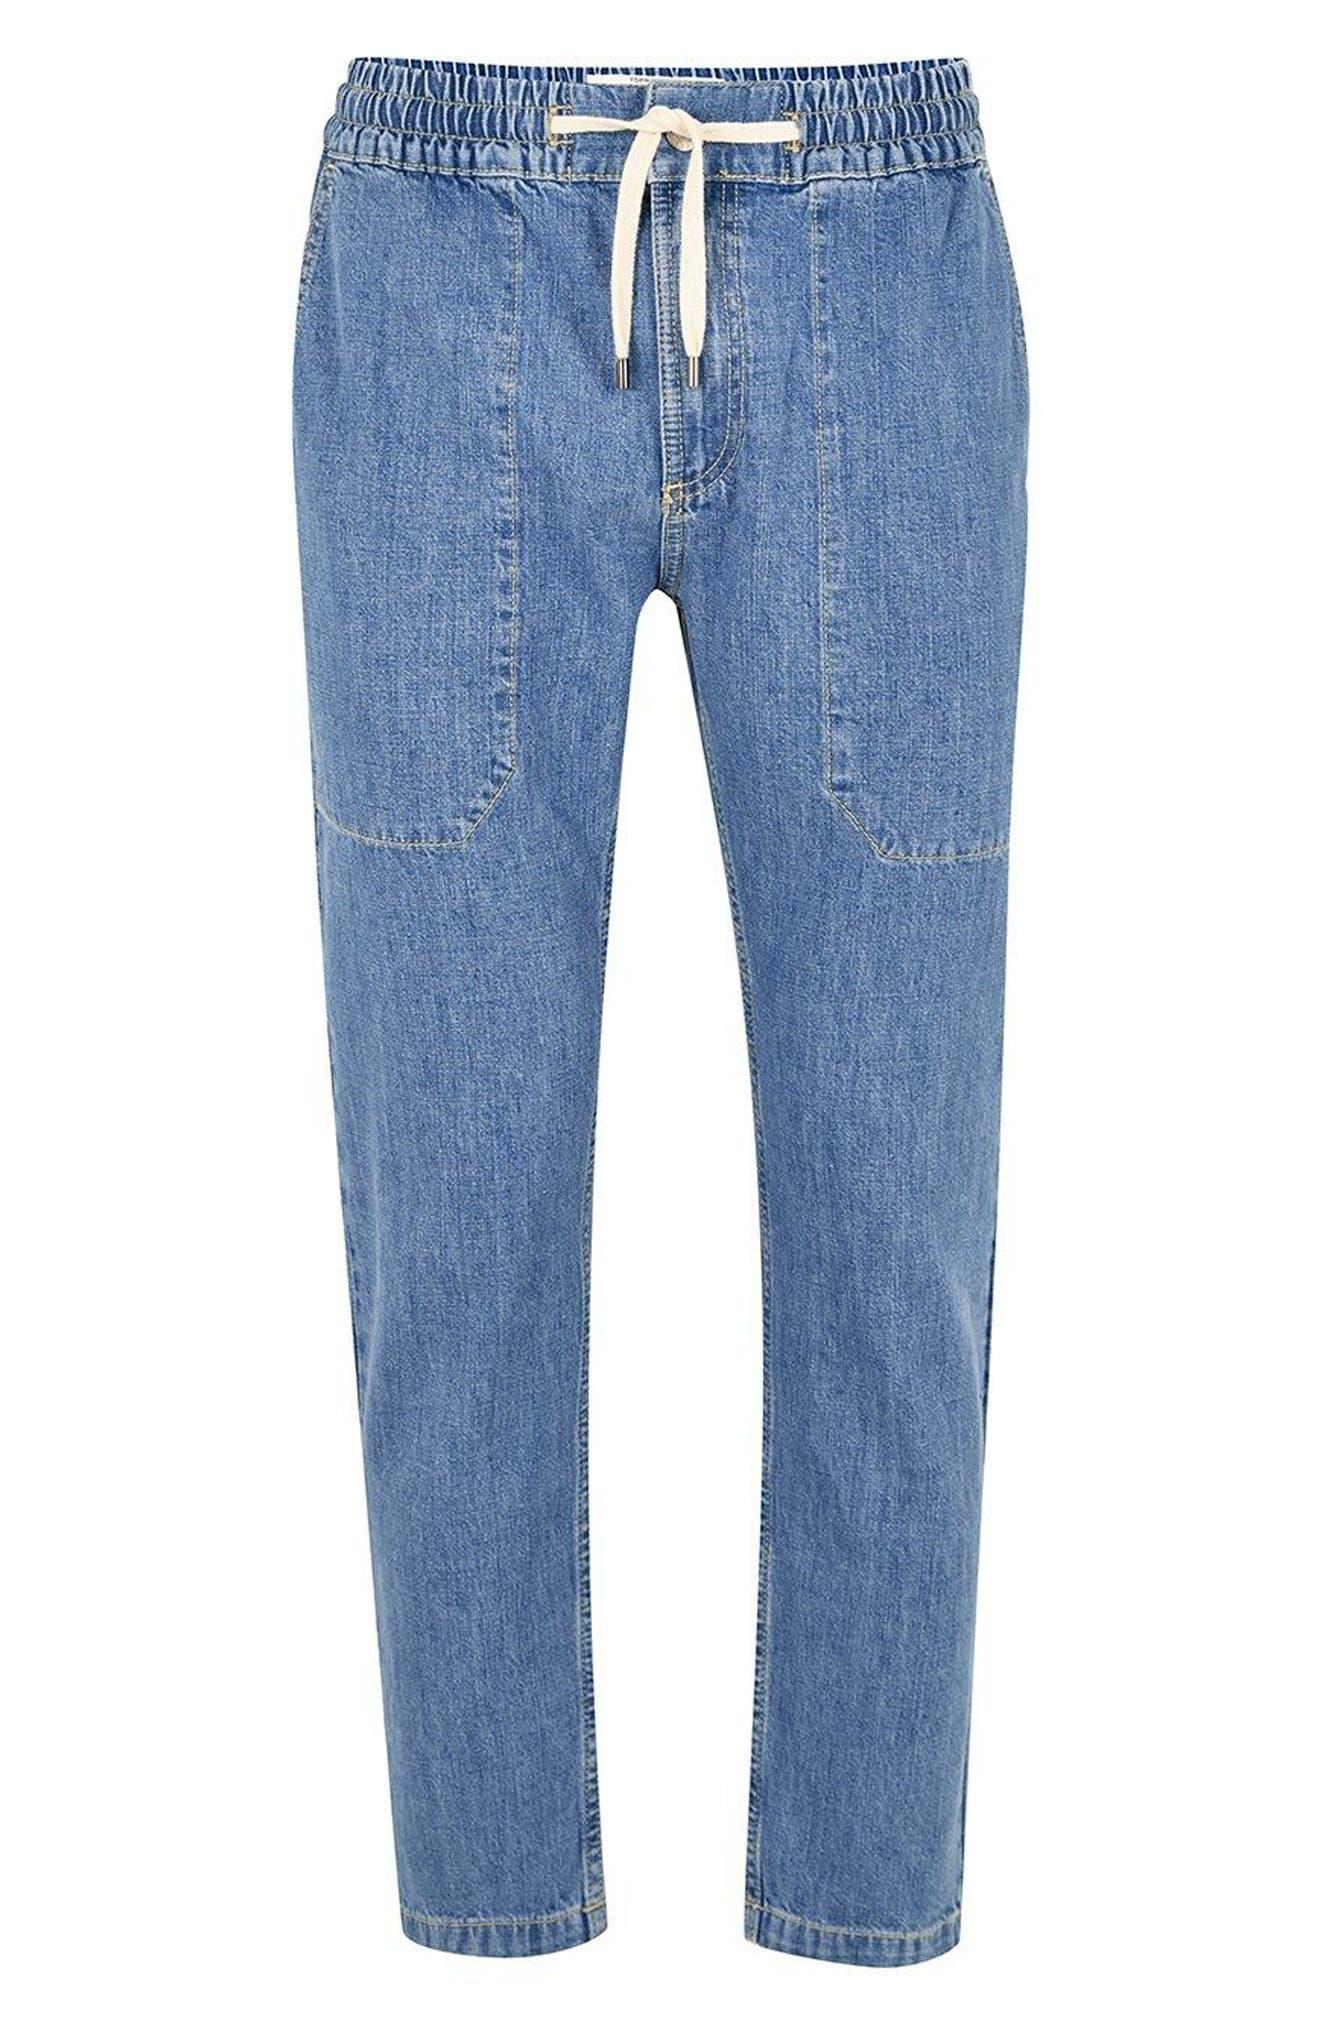 Tapered Fit Denim Jogger Pants,                             Alternate thumbnail 4, color,                             Blue